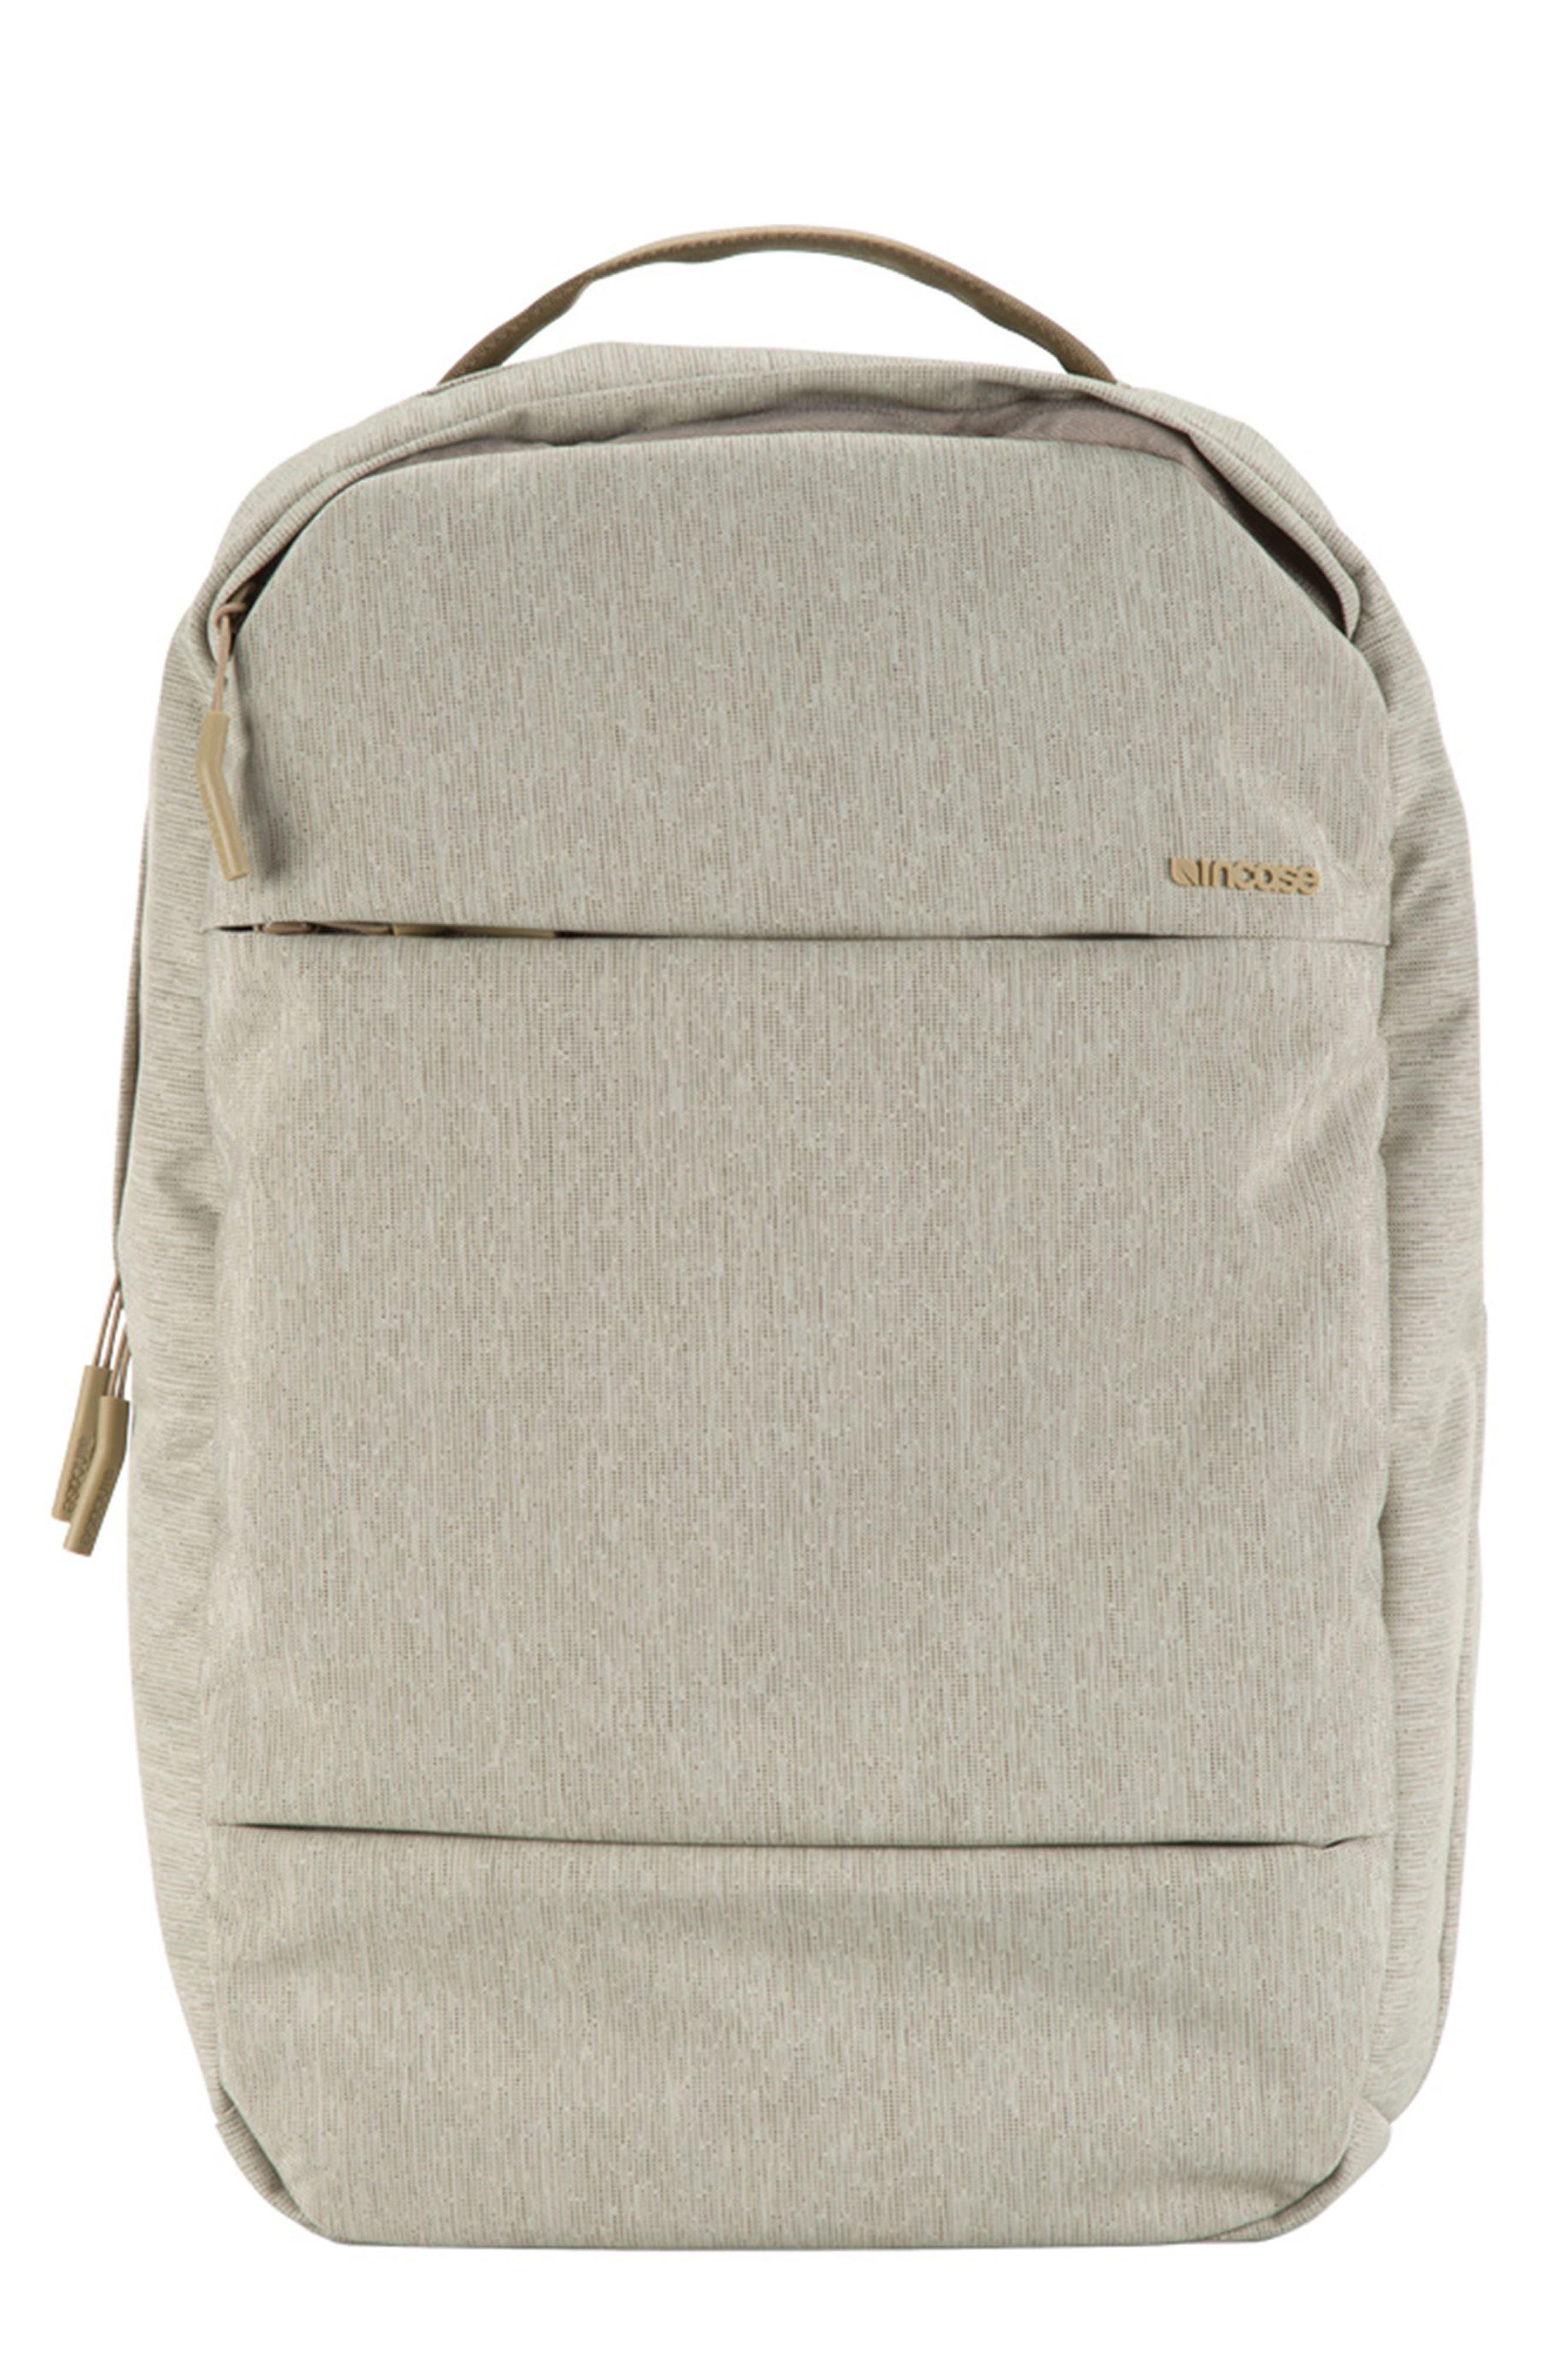 City Compact Backpack,                         Main,                         color, Heather Khaki